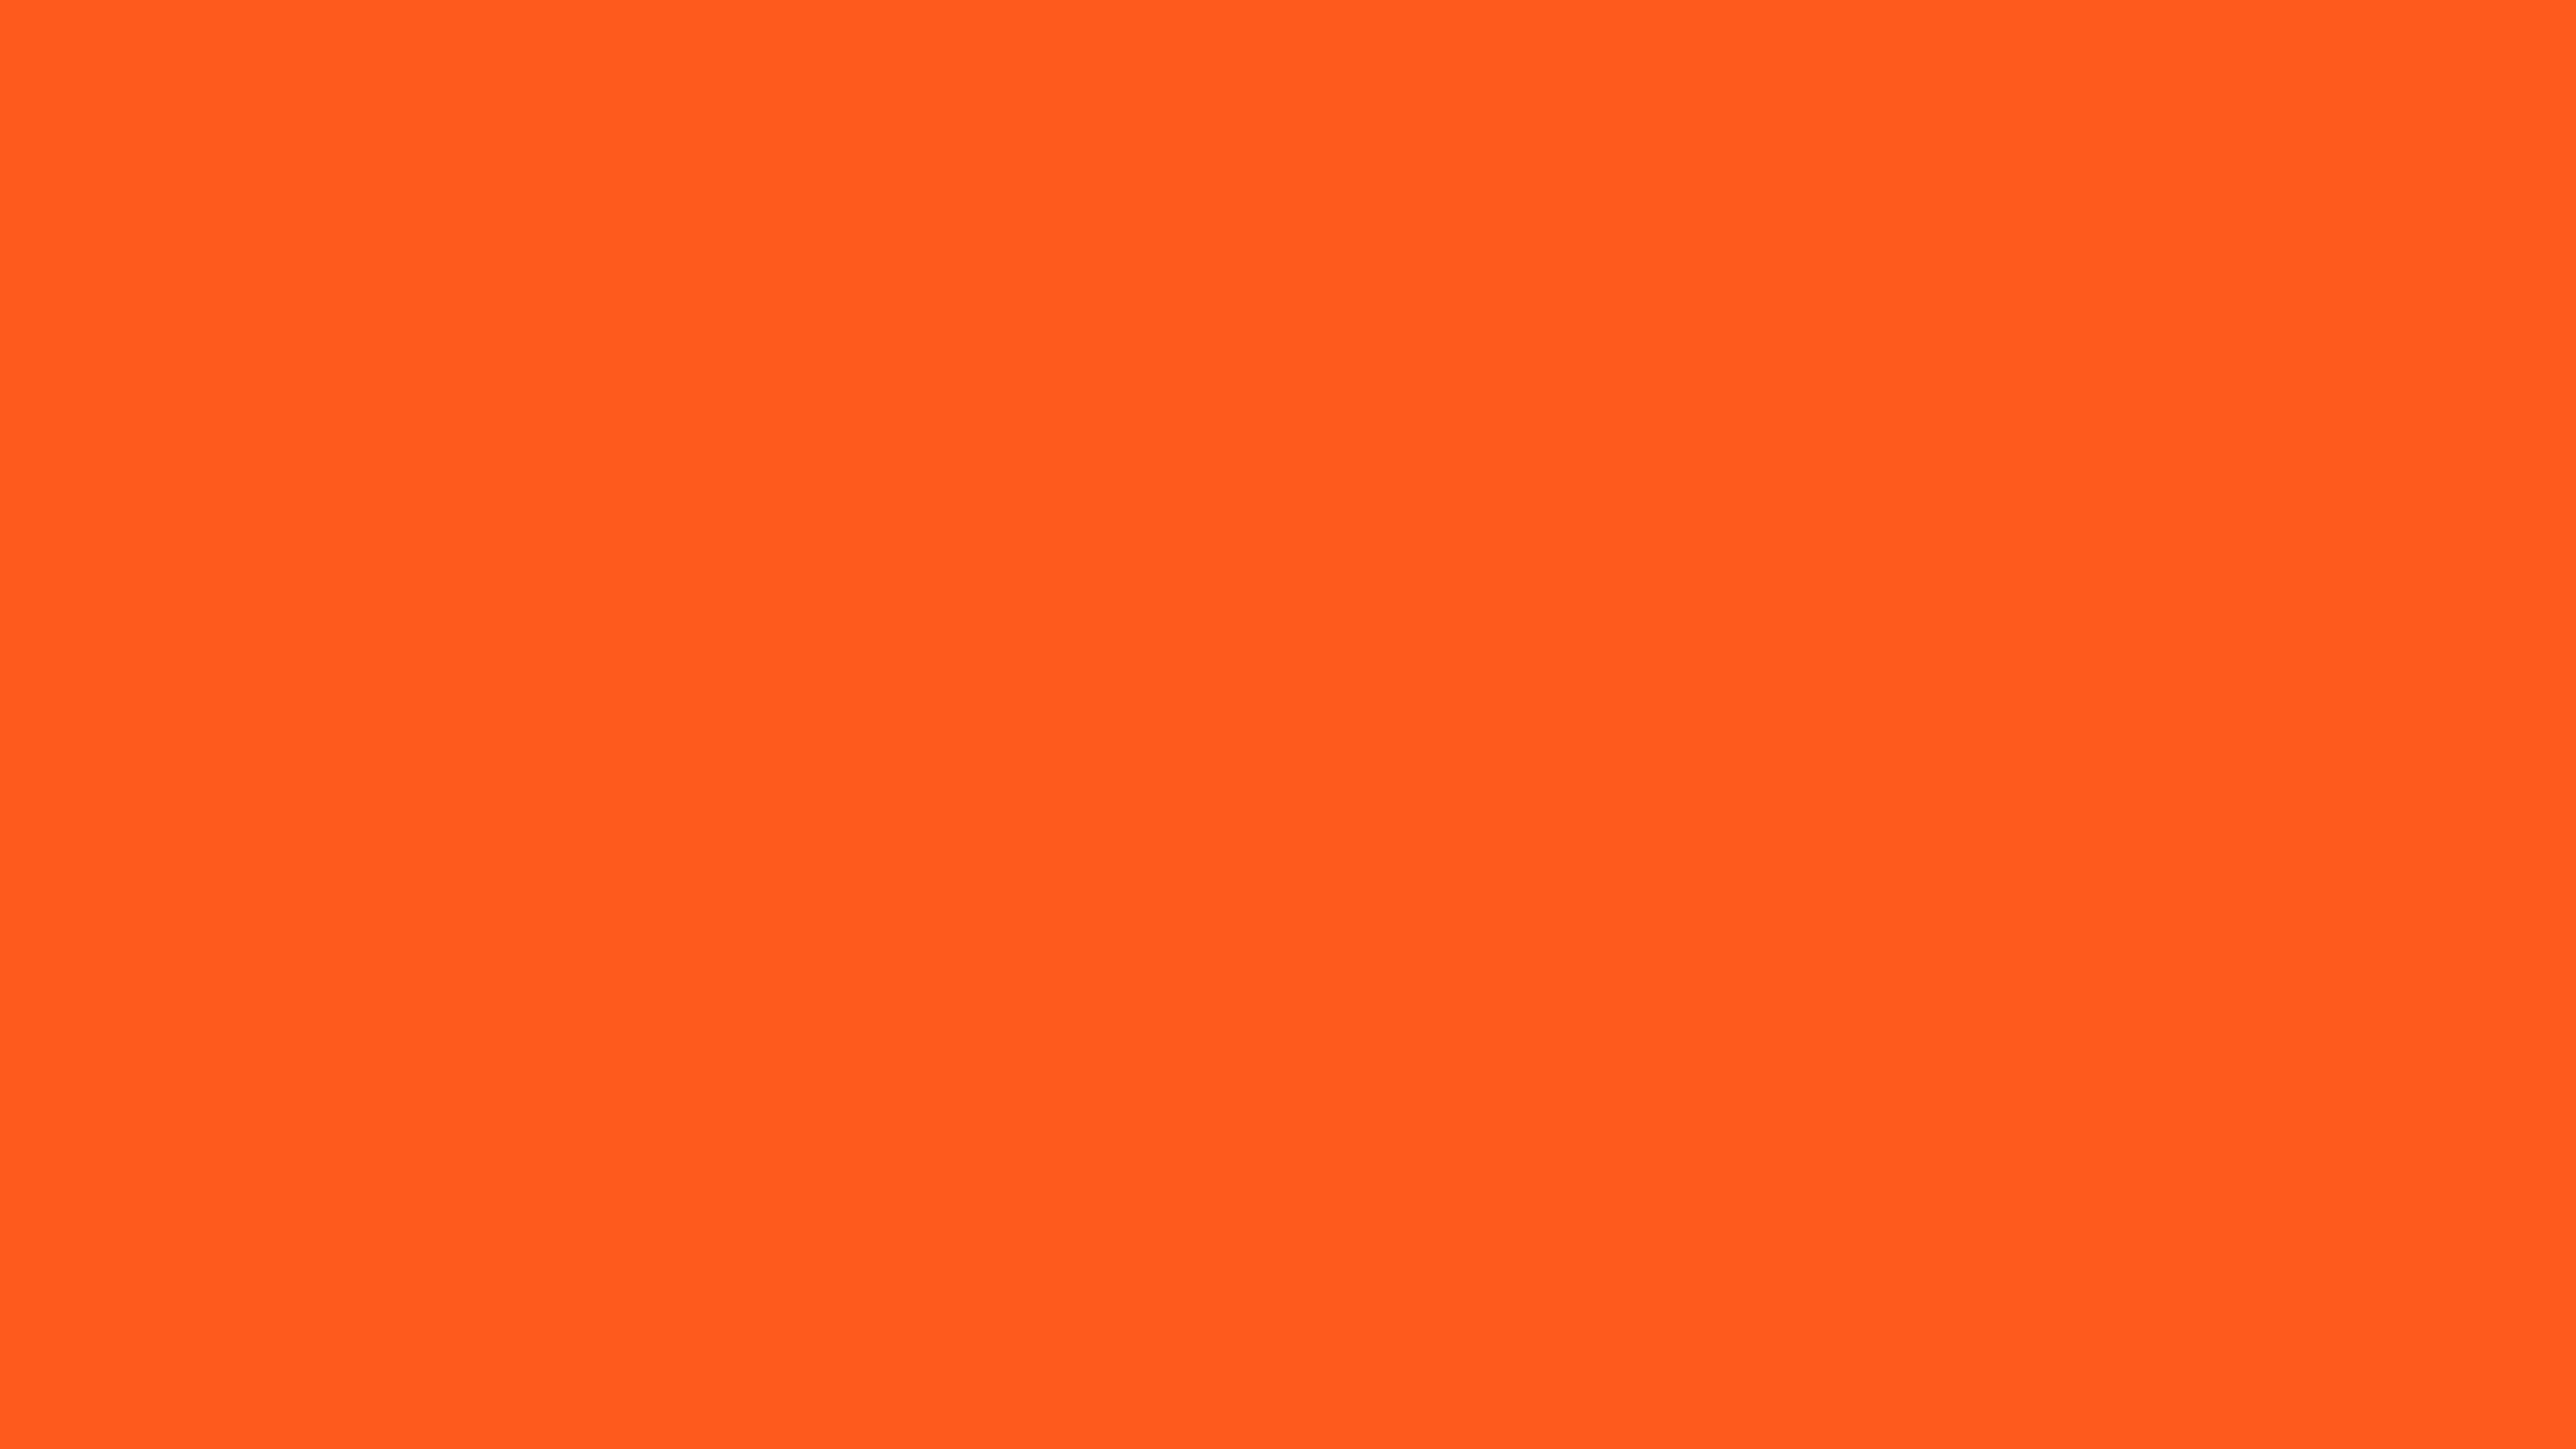 7680x4320 Giants Orange Solid Color Background